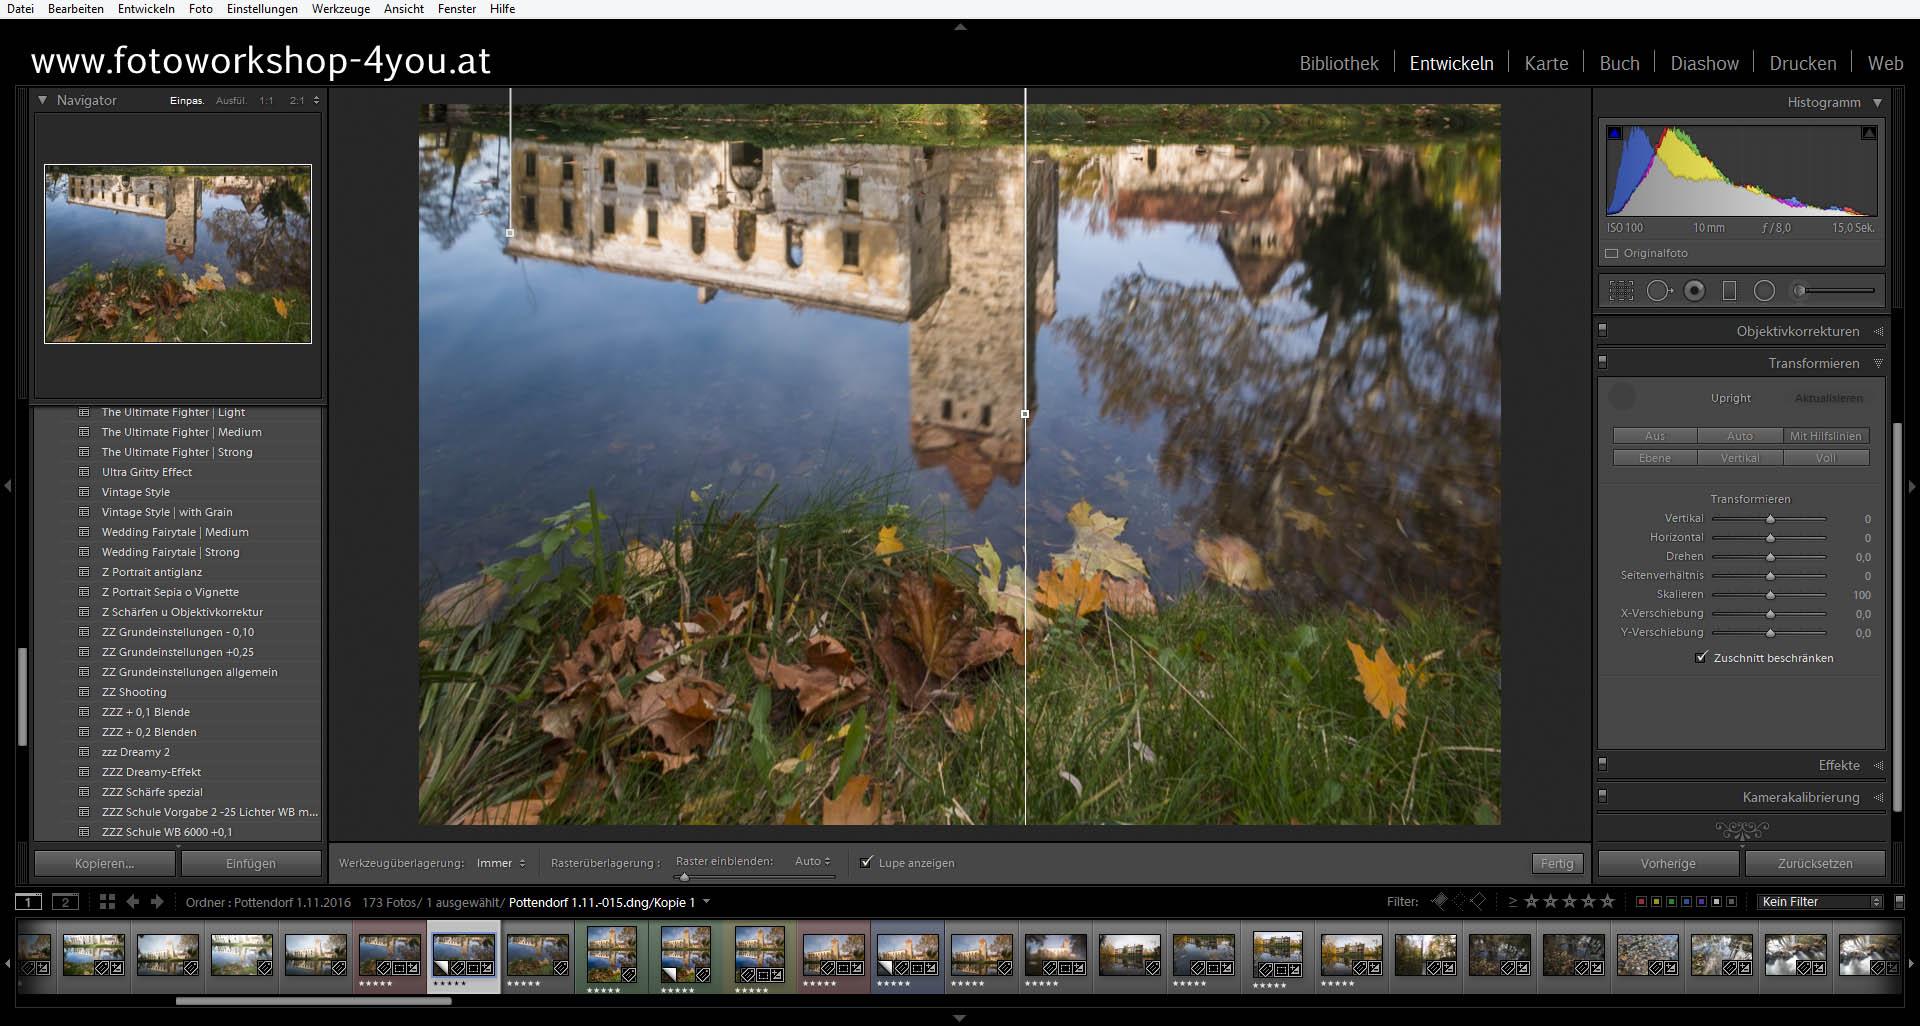 Pottendorf-Panorama - Fotokurse mit Martin Winkler